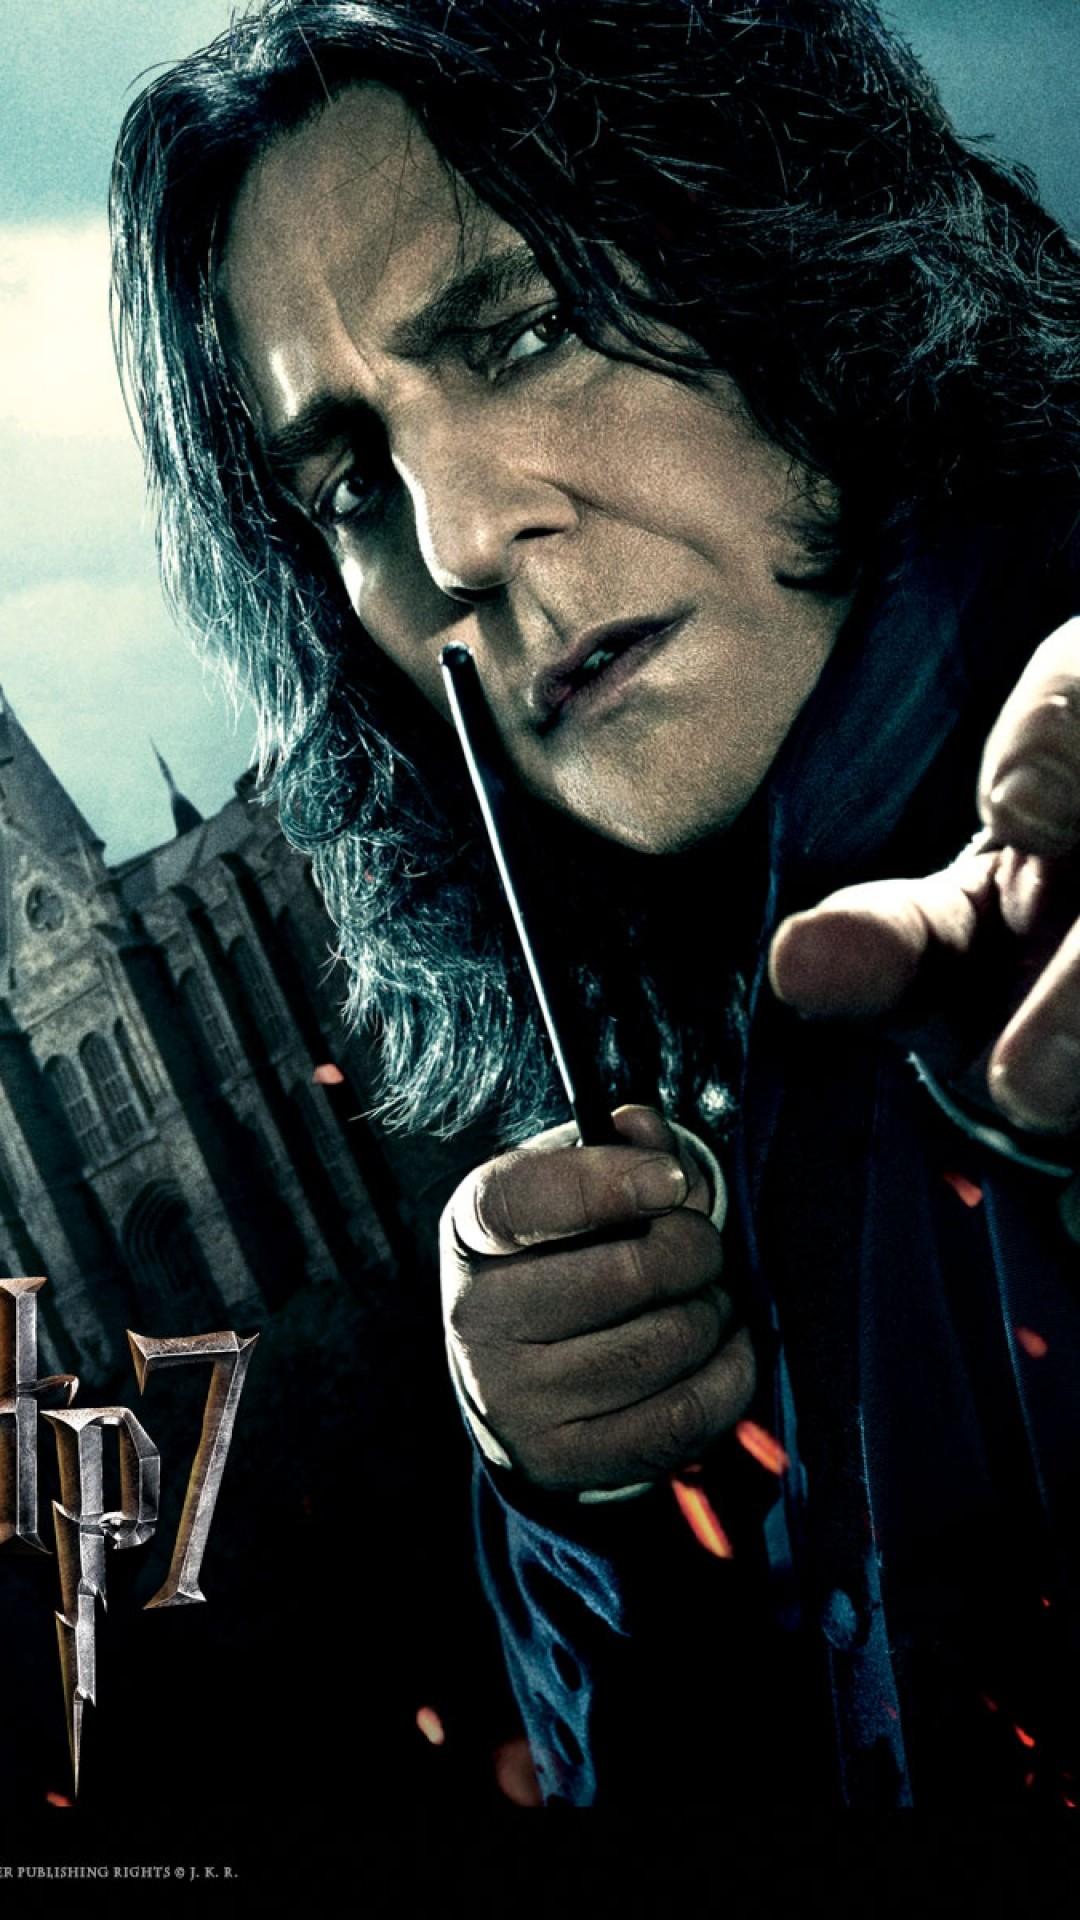 Movie - Harry Potter - Severus Snape - Alan Rickman